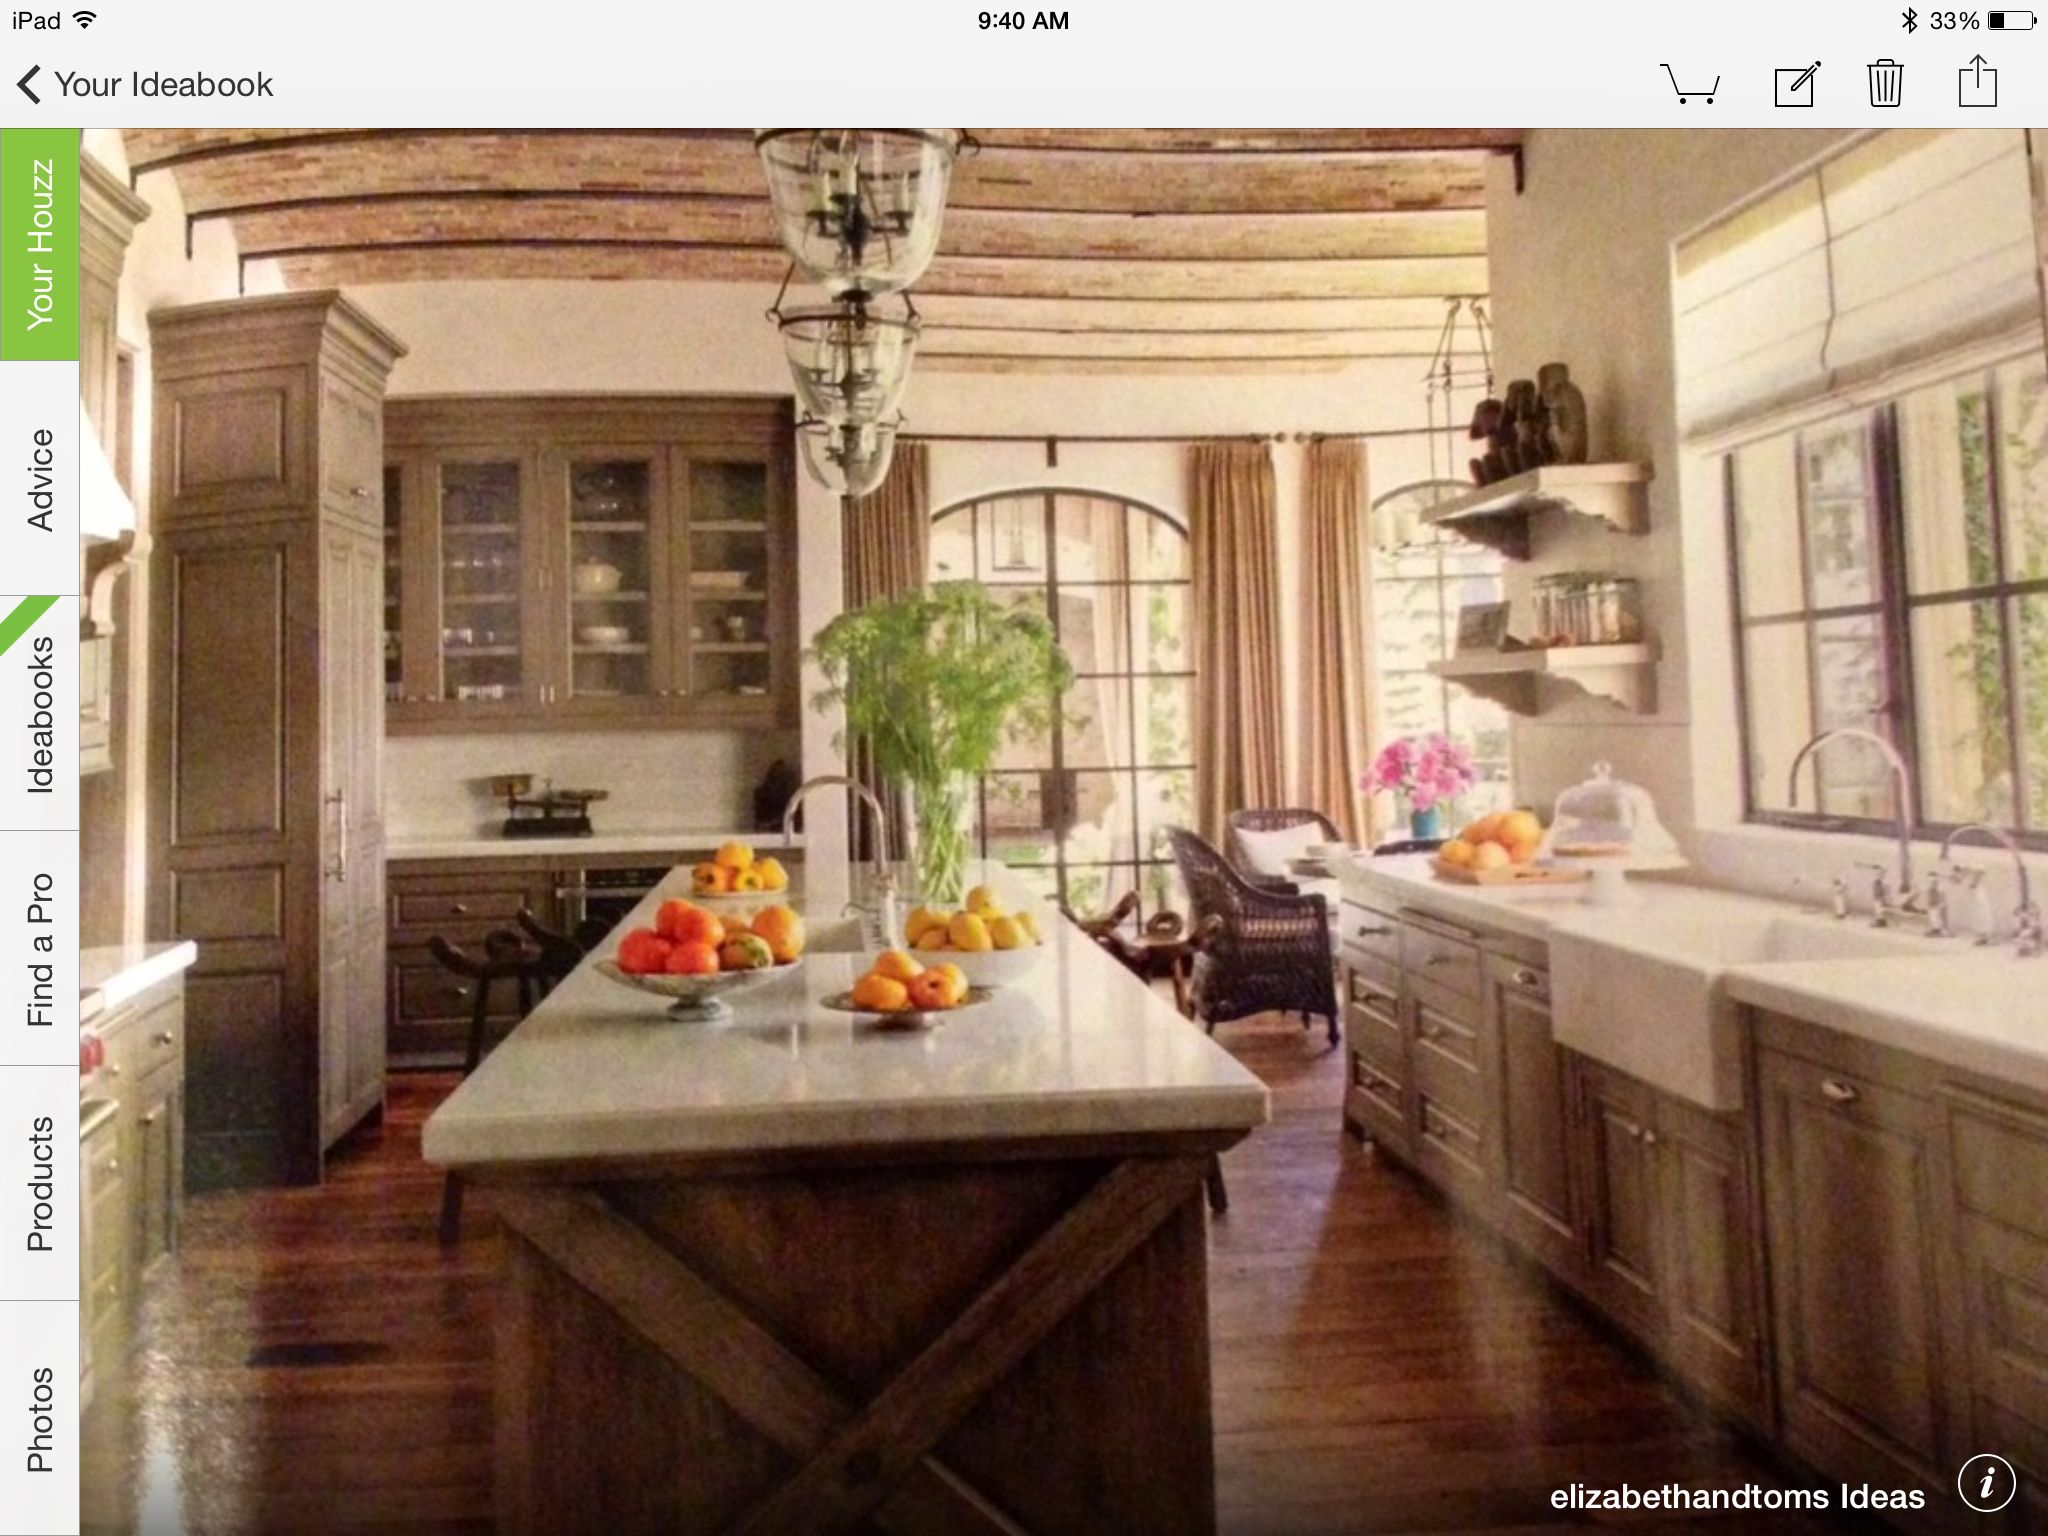 cabinet color farmhouse kitchen design modern farmhouse on best farmhouse kitchen decor ideas and remodel create your dreams id=63974